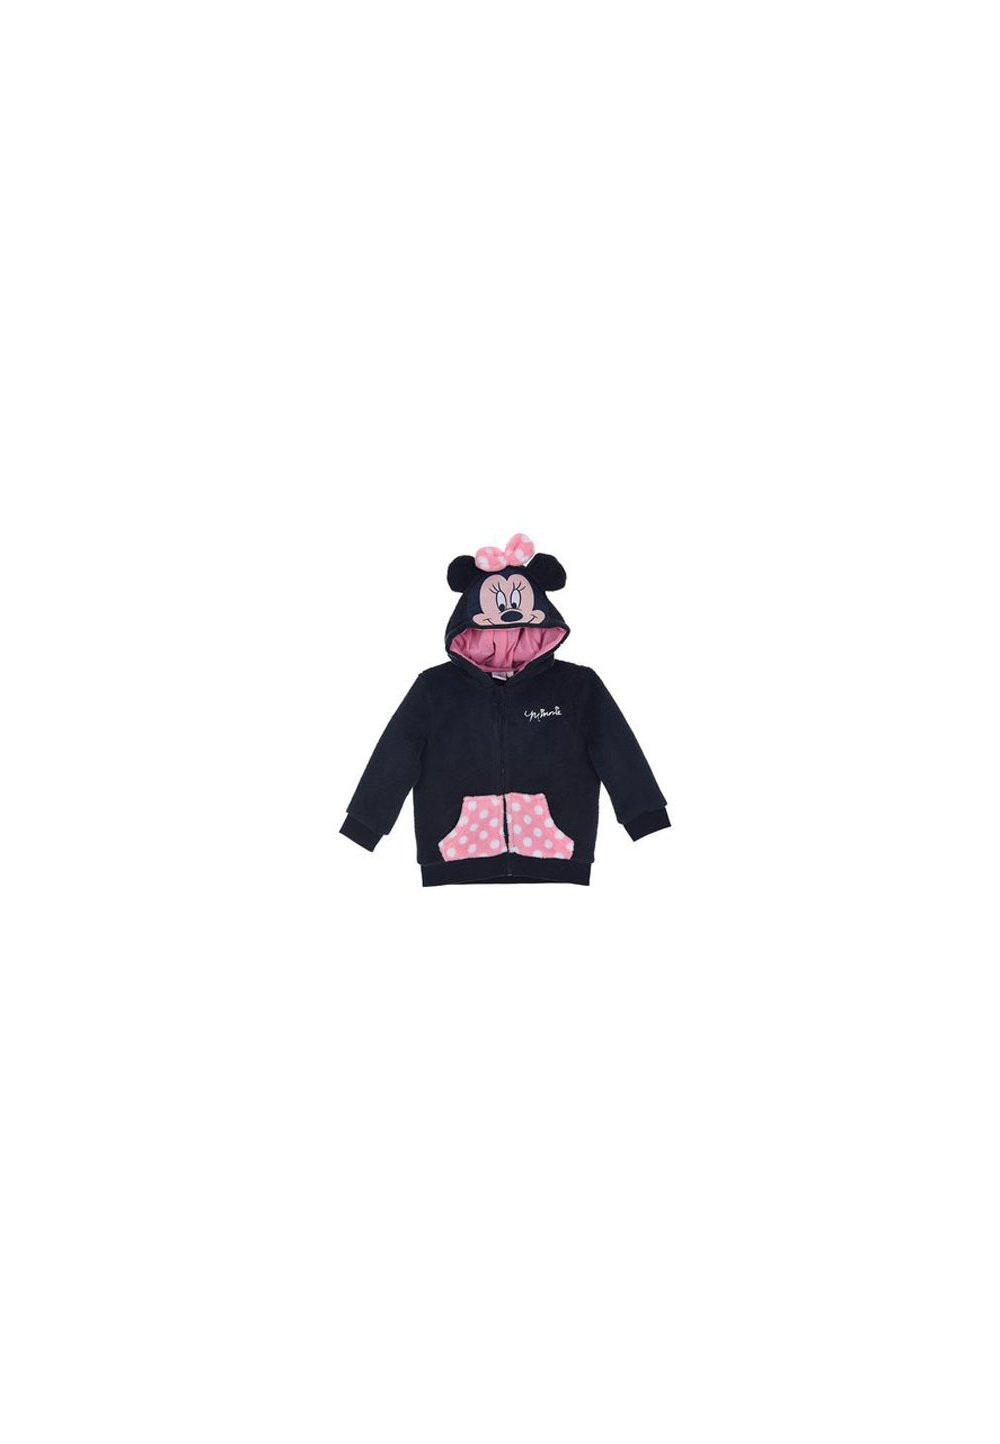 Geaca fleece, Minnie cu fundita roz, bluemarin imagine